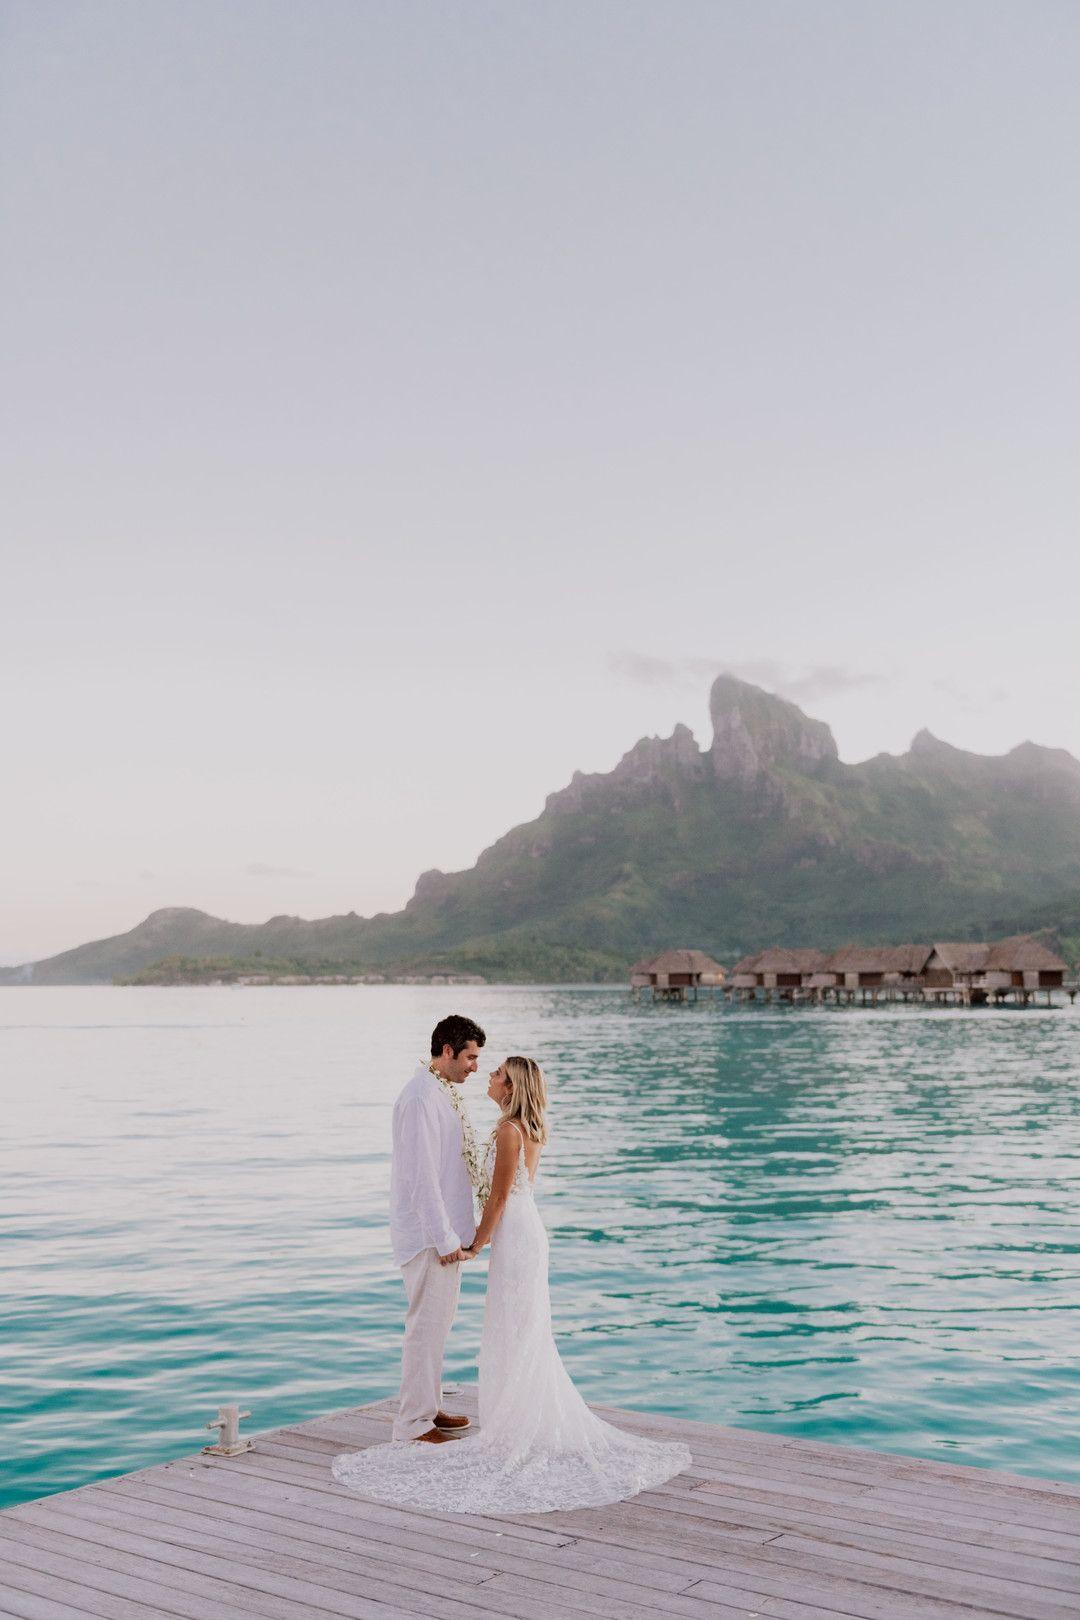 Elopement At The Four Seasons In Bora Bora Bora Bora Wedding Couple Destinations Caribbean Wedding